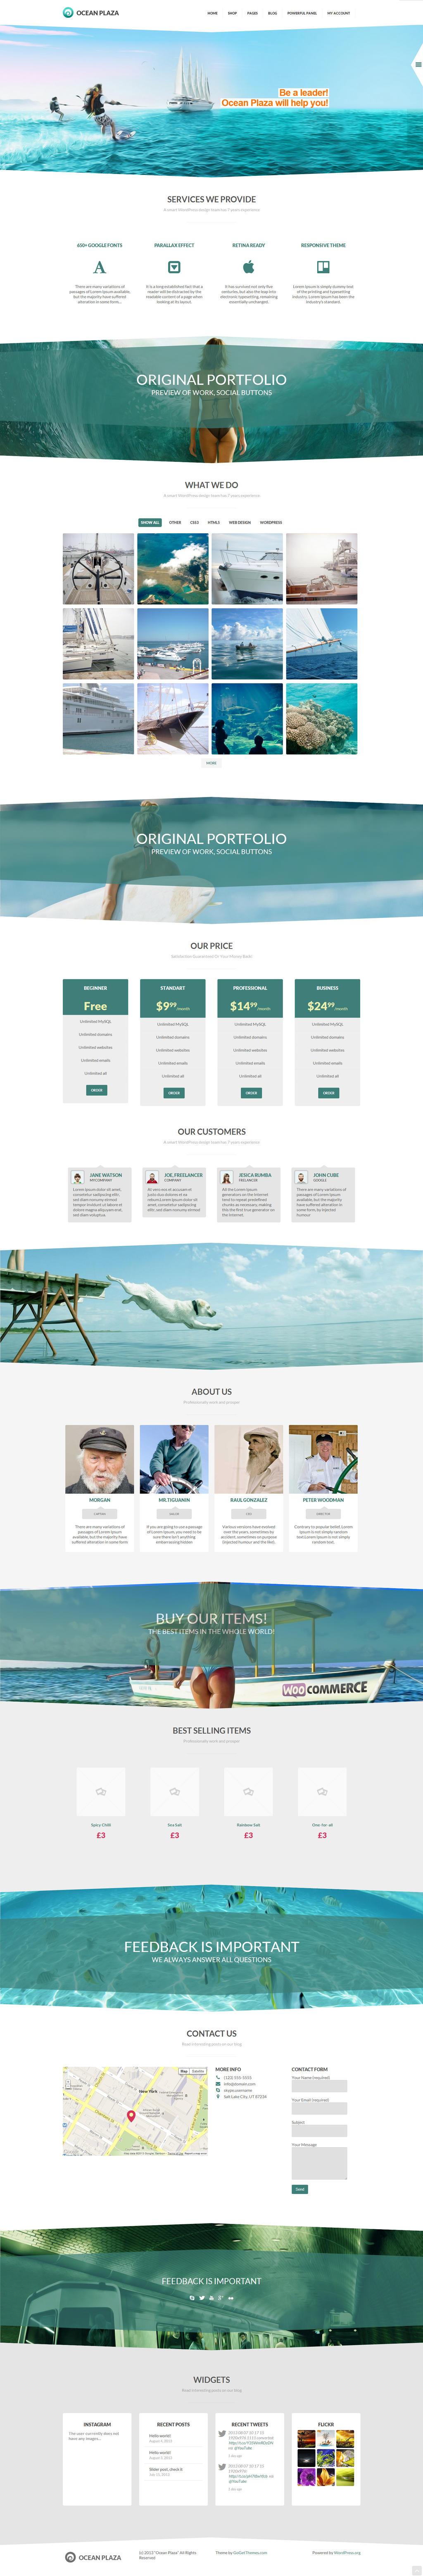 OceanPlaza WordPress Parallax Theme by DarkStaLkeRR